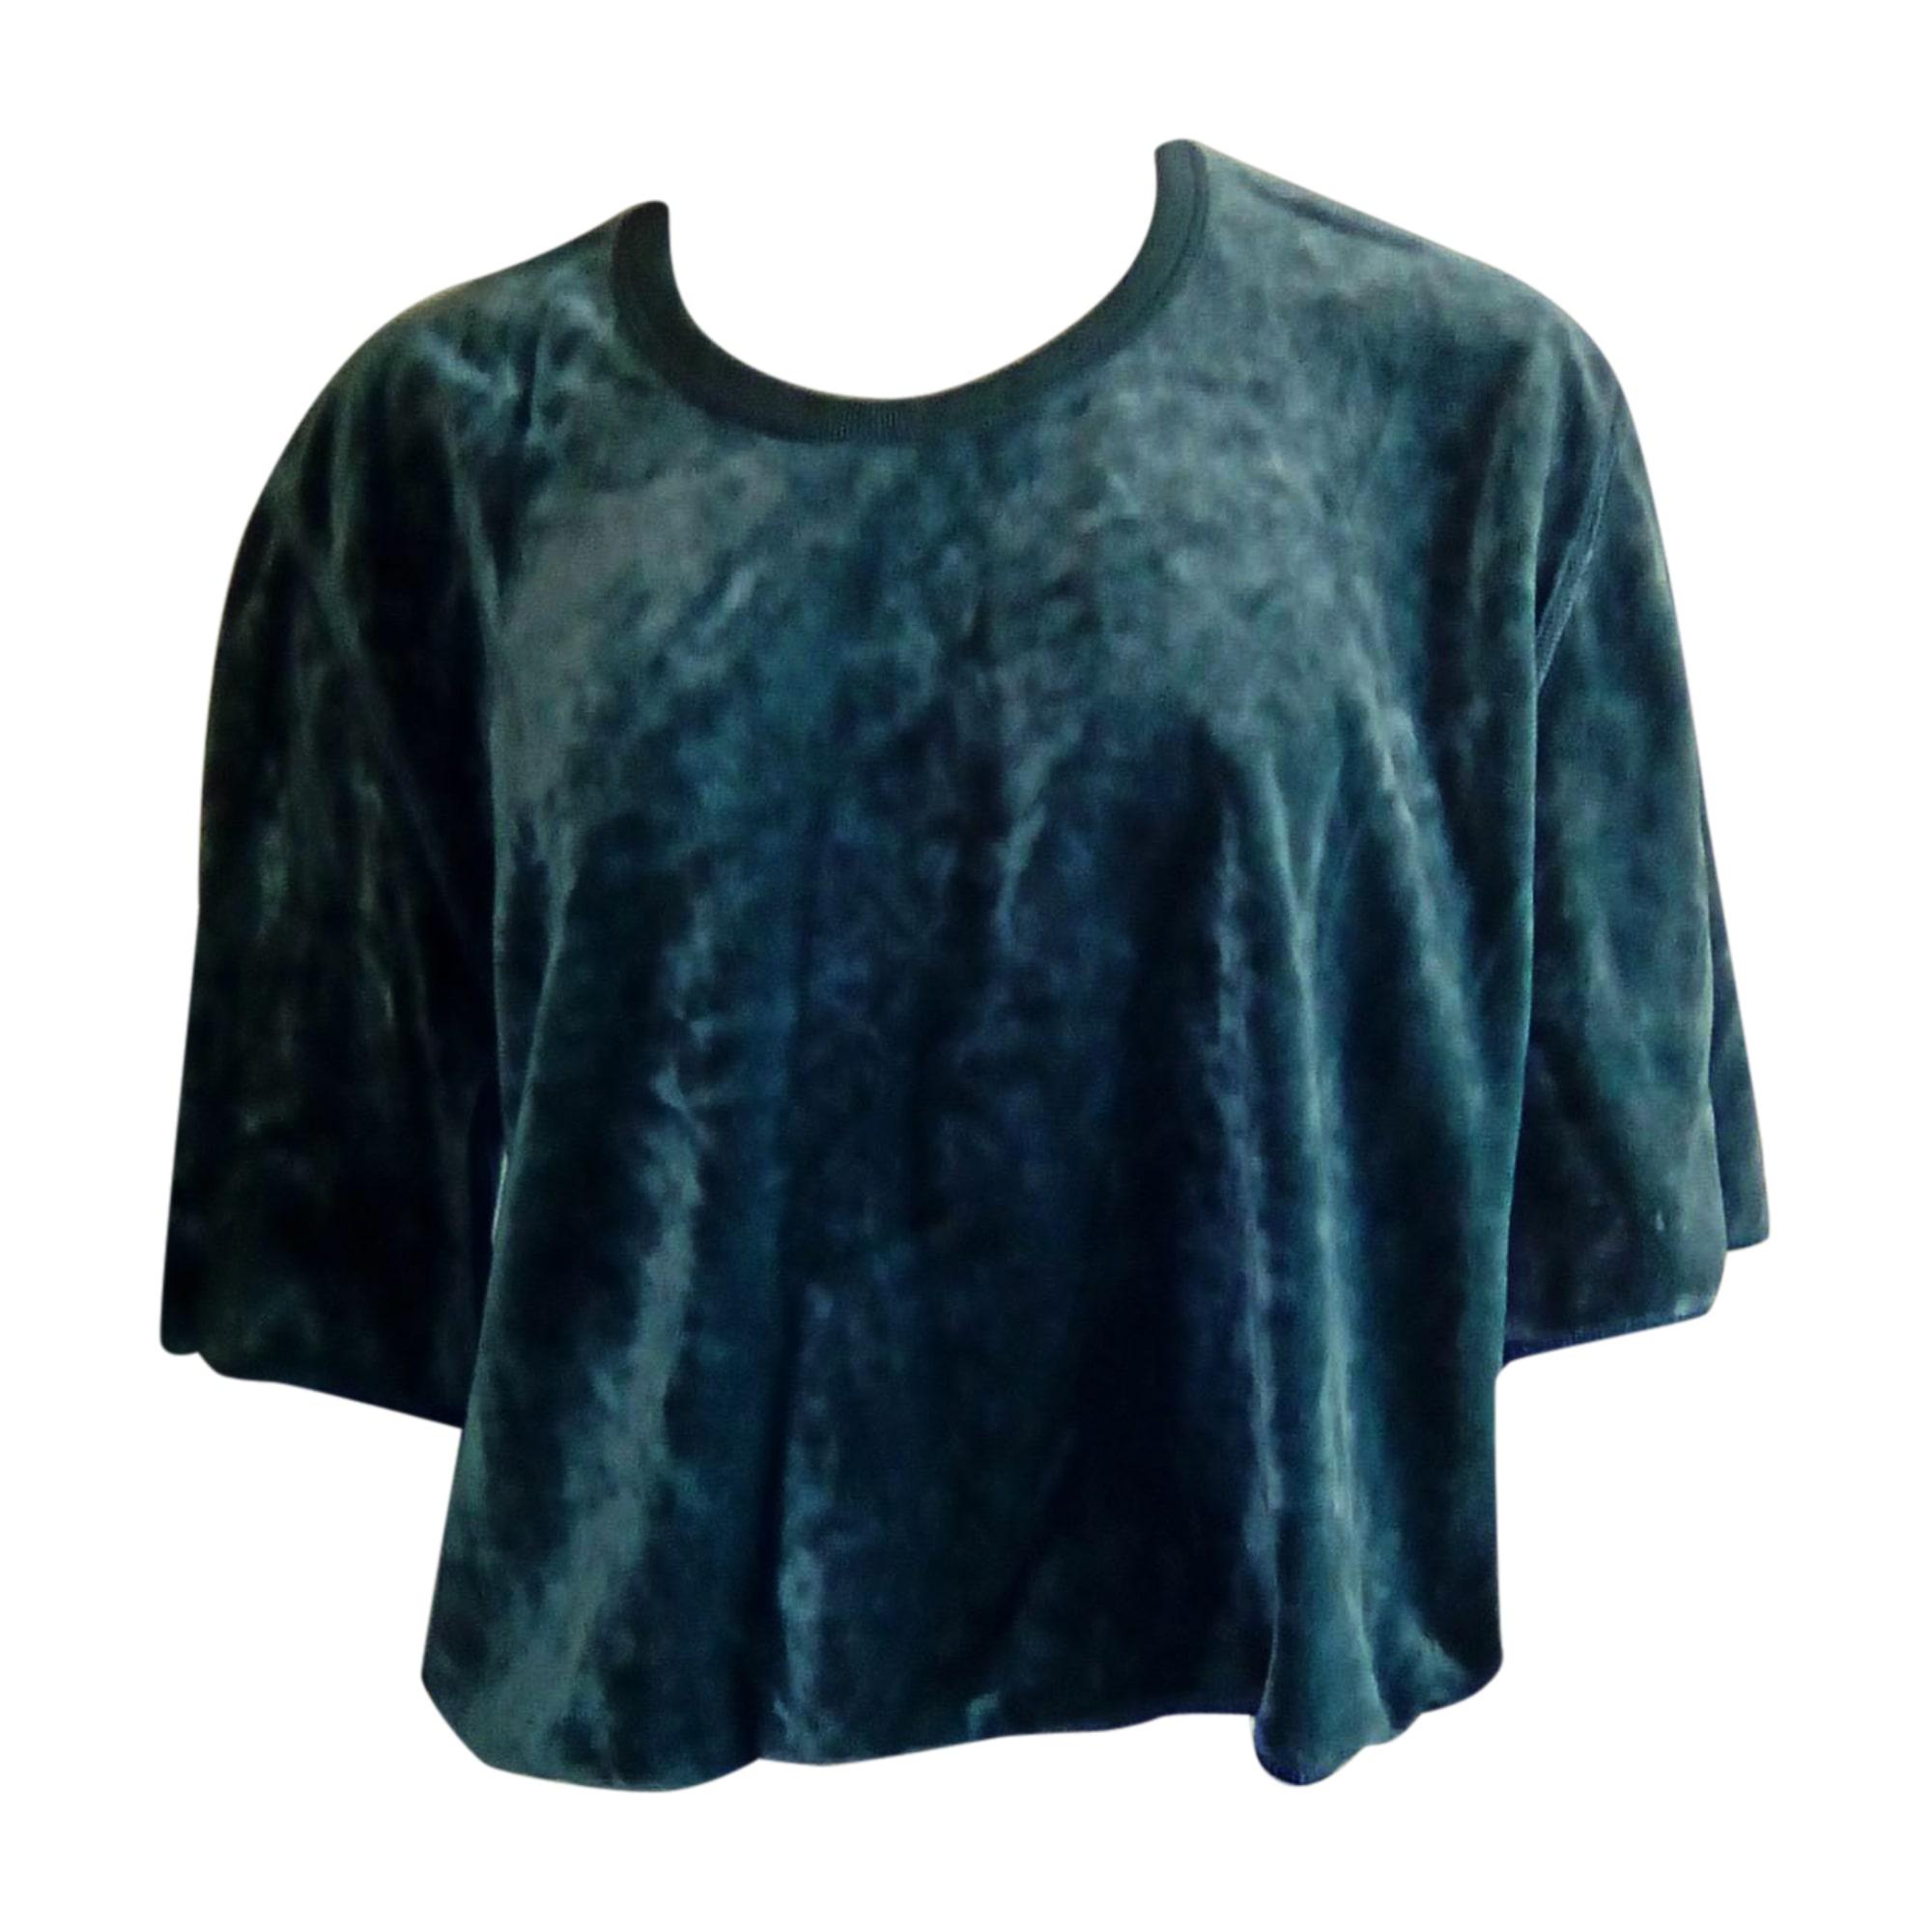 Top, tee-shirt SONIA RYKIEL Gris, anthracite